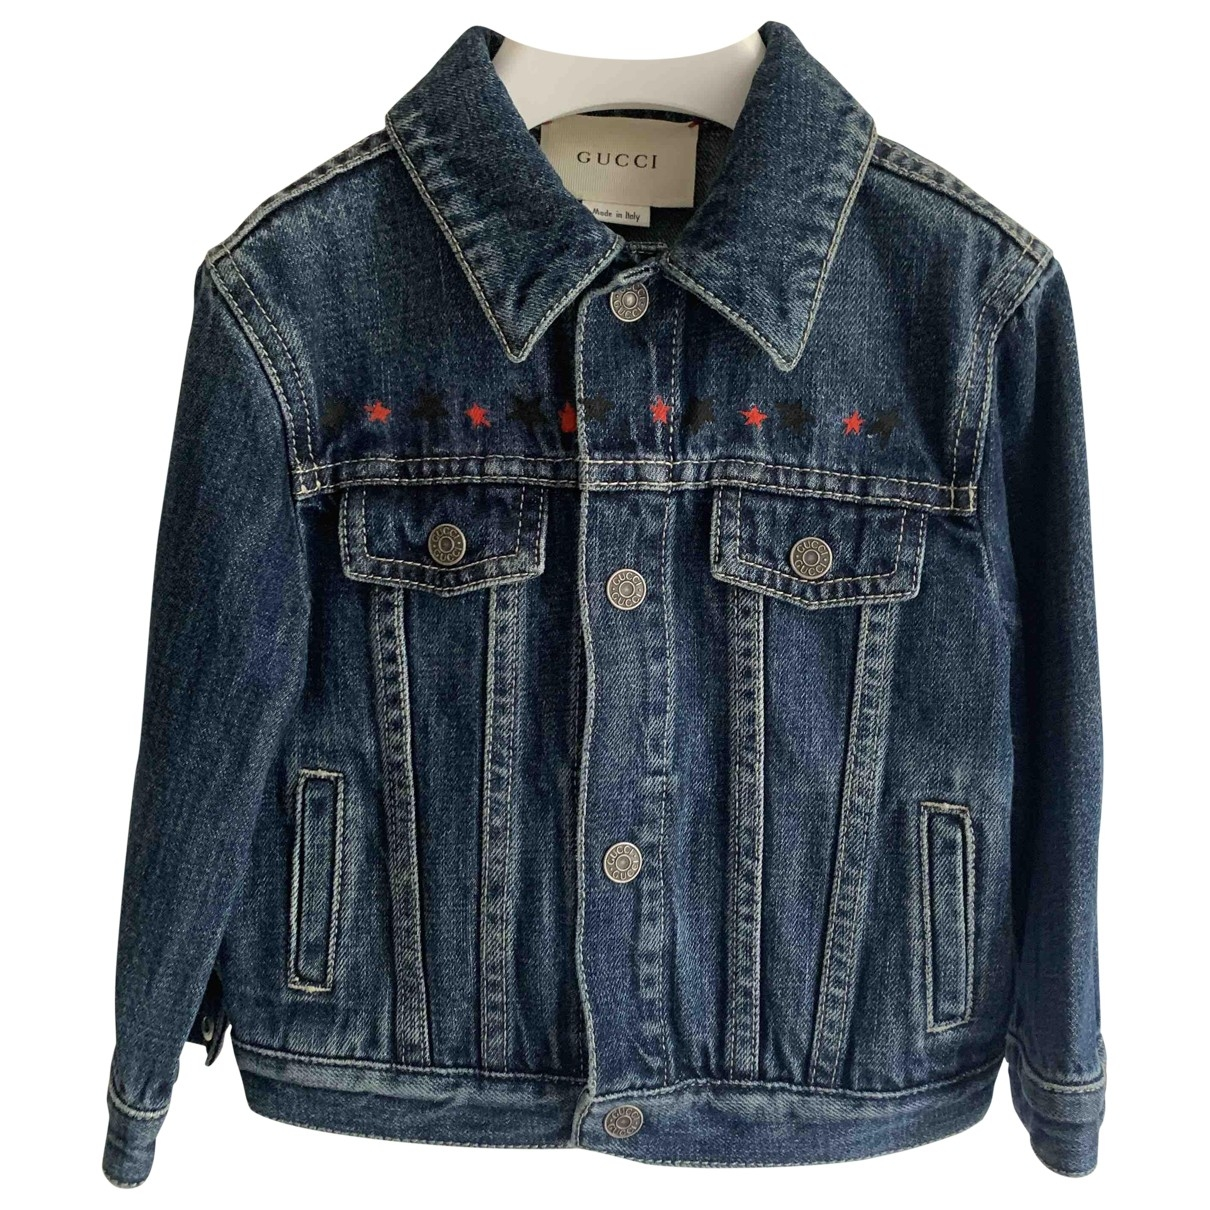 Gucci \N Jacke, Maentel in Denim - Jeans